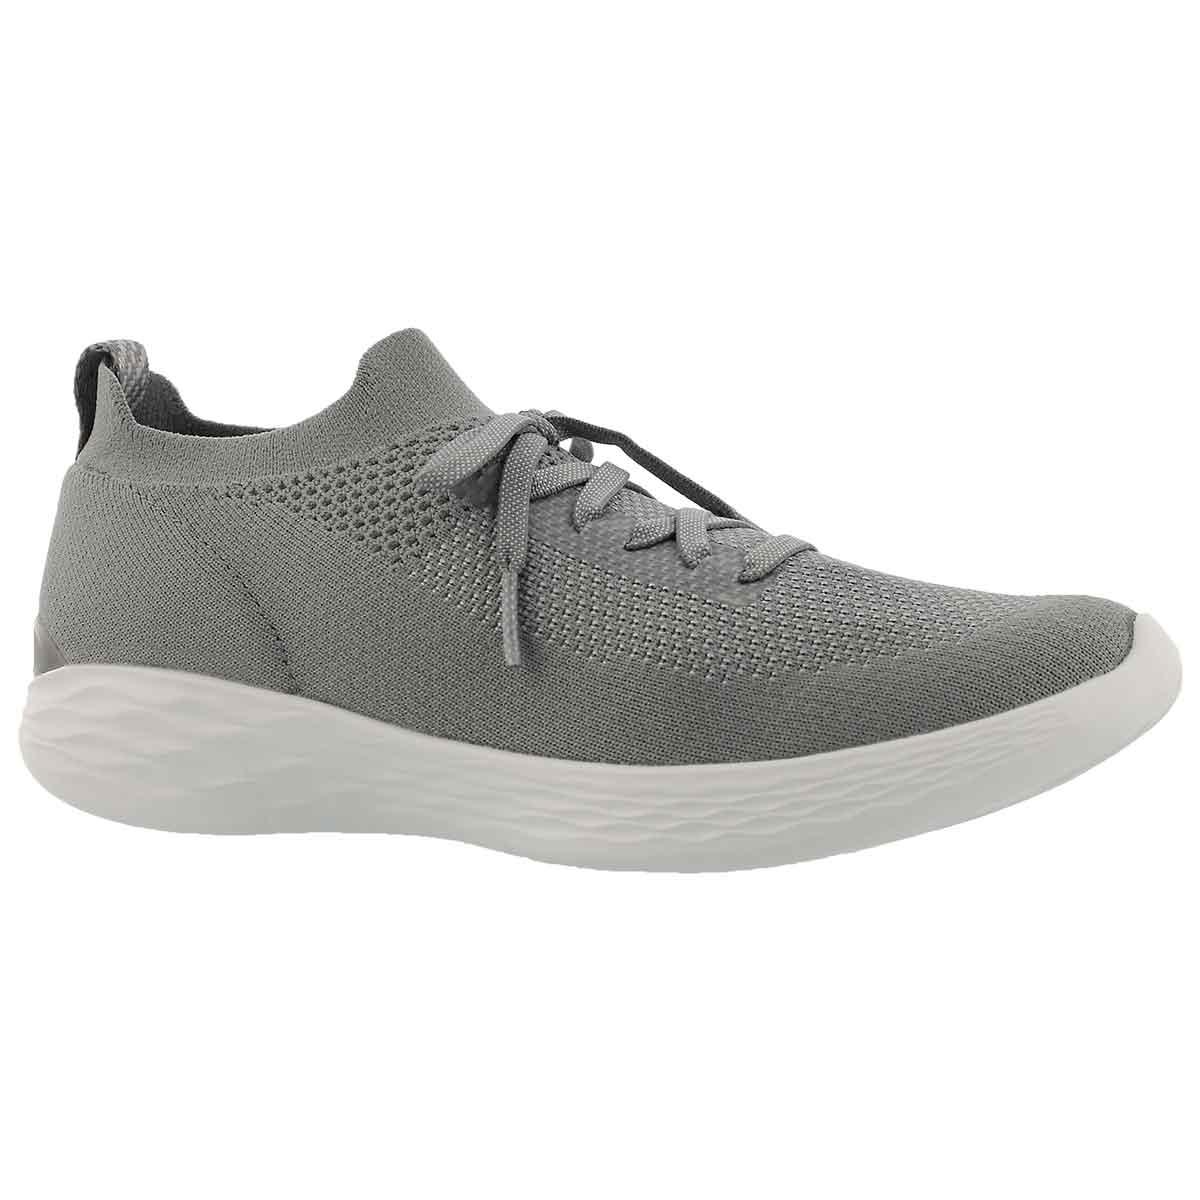 Women's YOU SHINE grey slip on sneakers